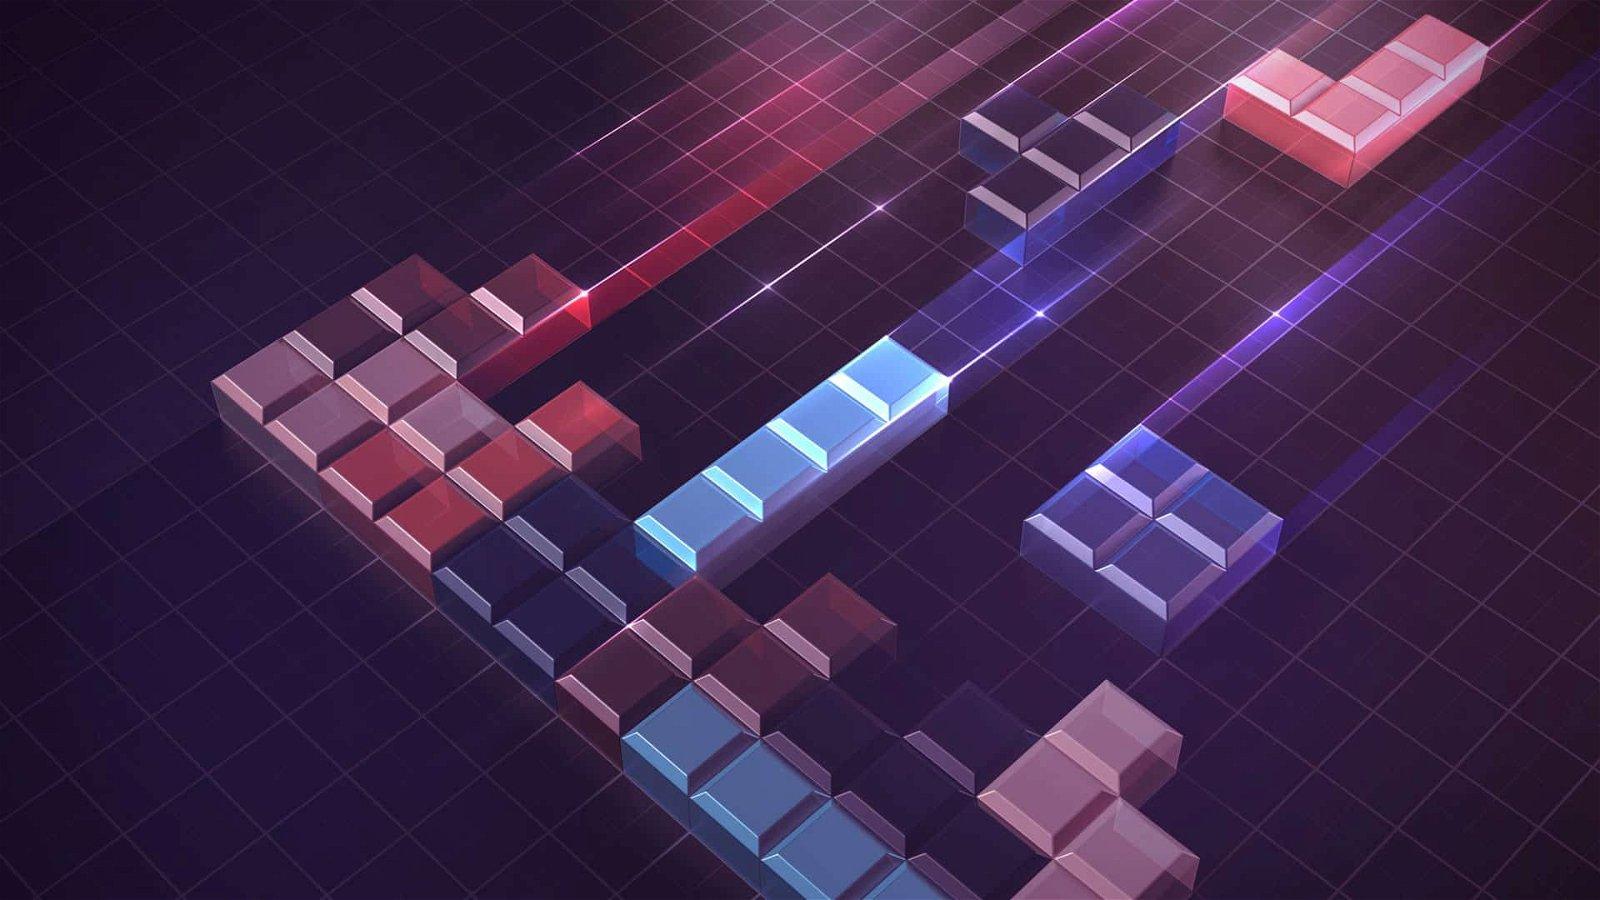 Tetris Effect is Mesmerizing 3